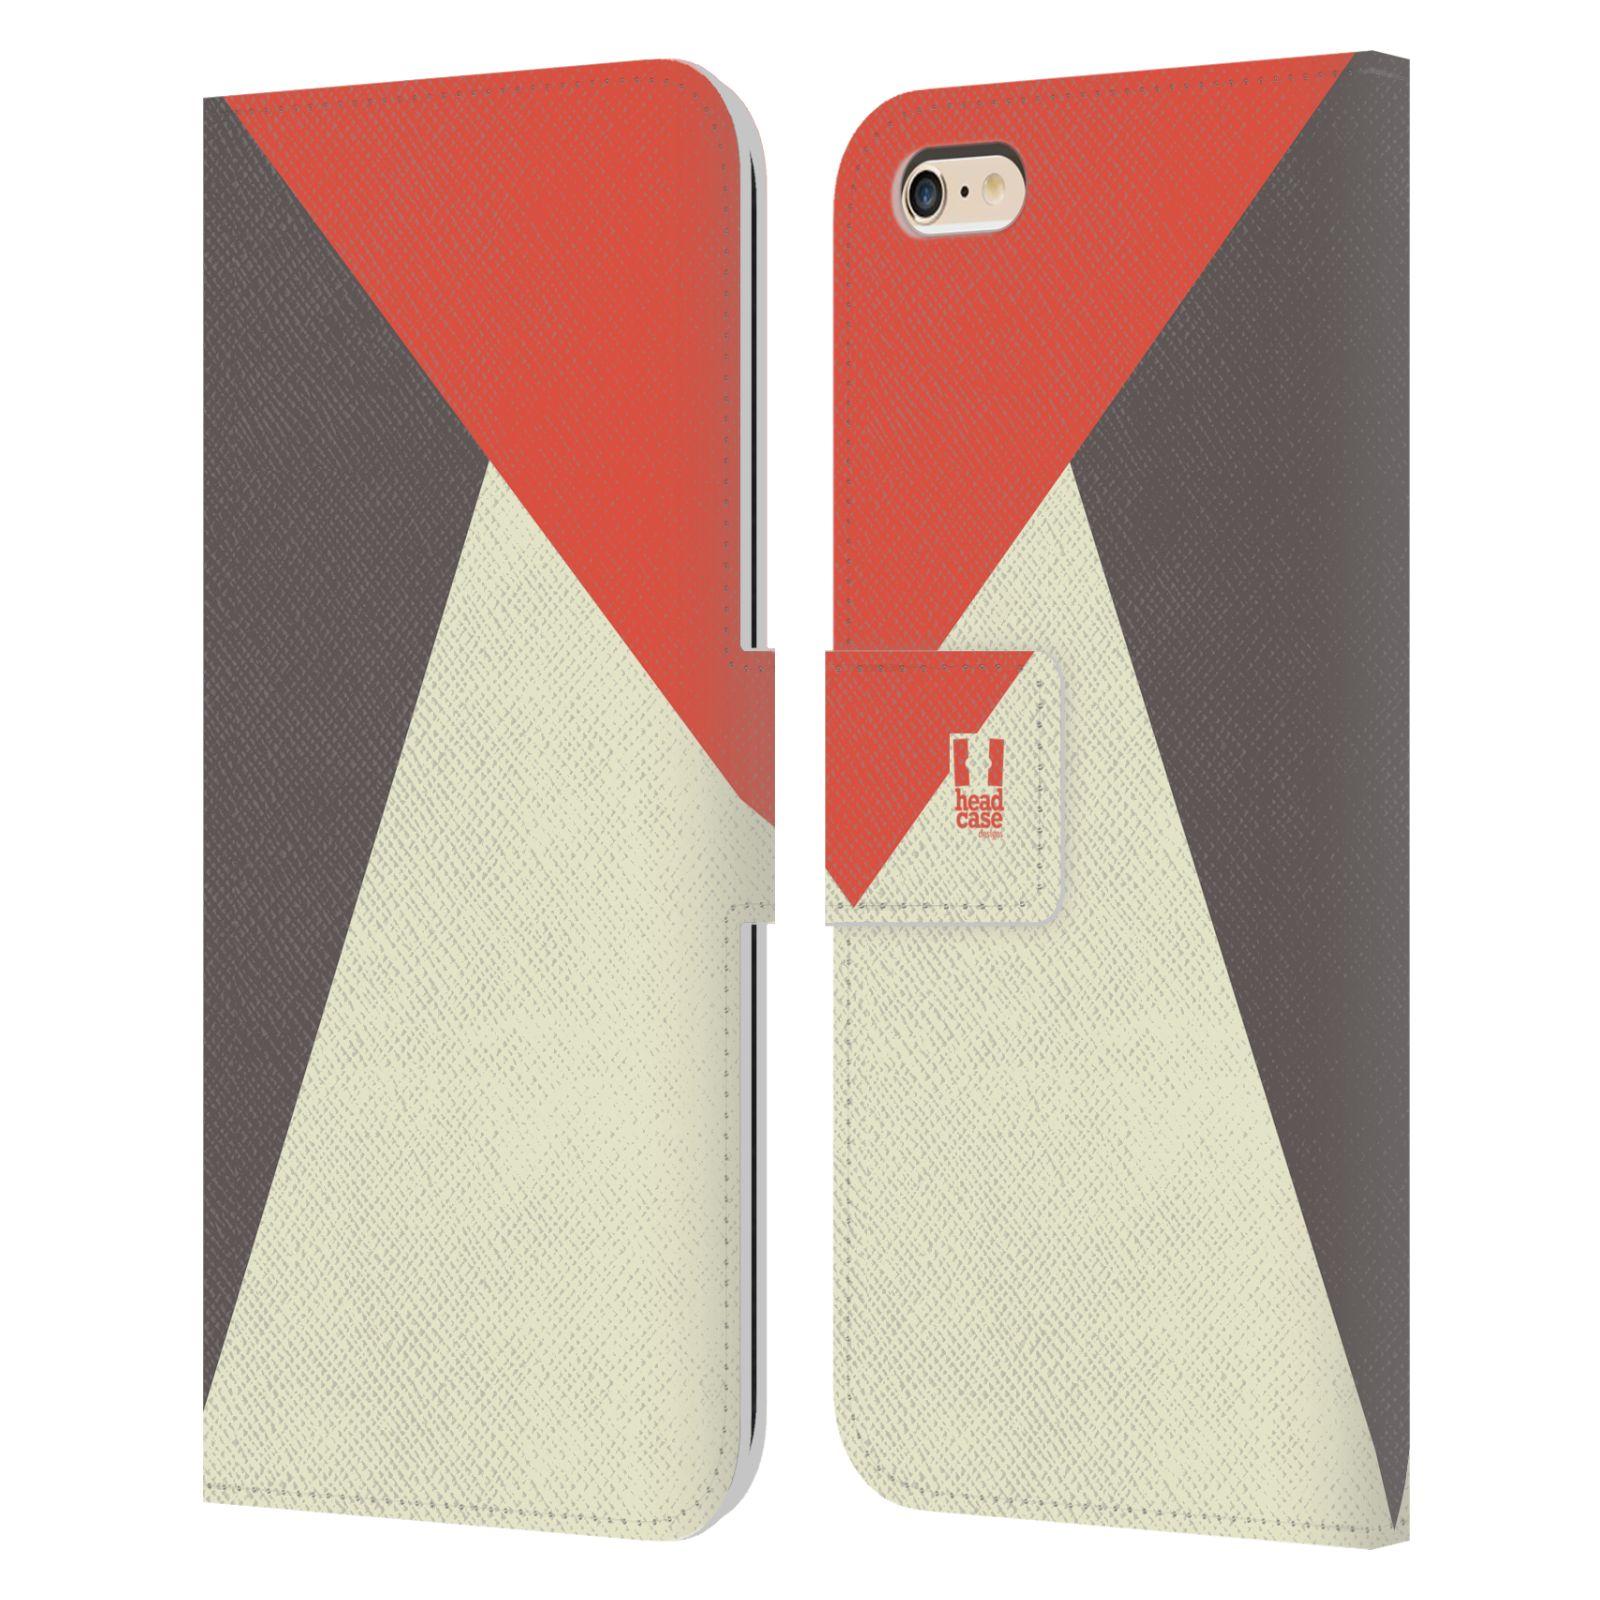 HEAD CASE Flipové pouzdro pro mobil Apple Iphone 6 PLUS/6S PLUS barevné tvary červená a šedá COOL